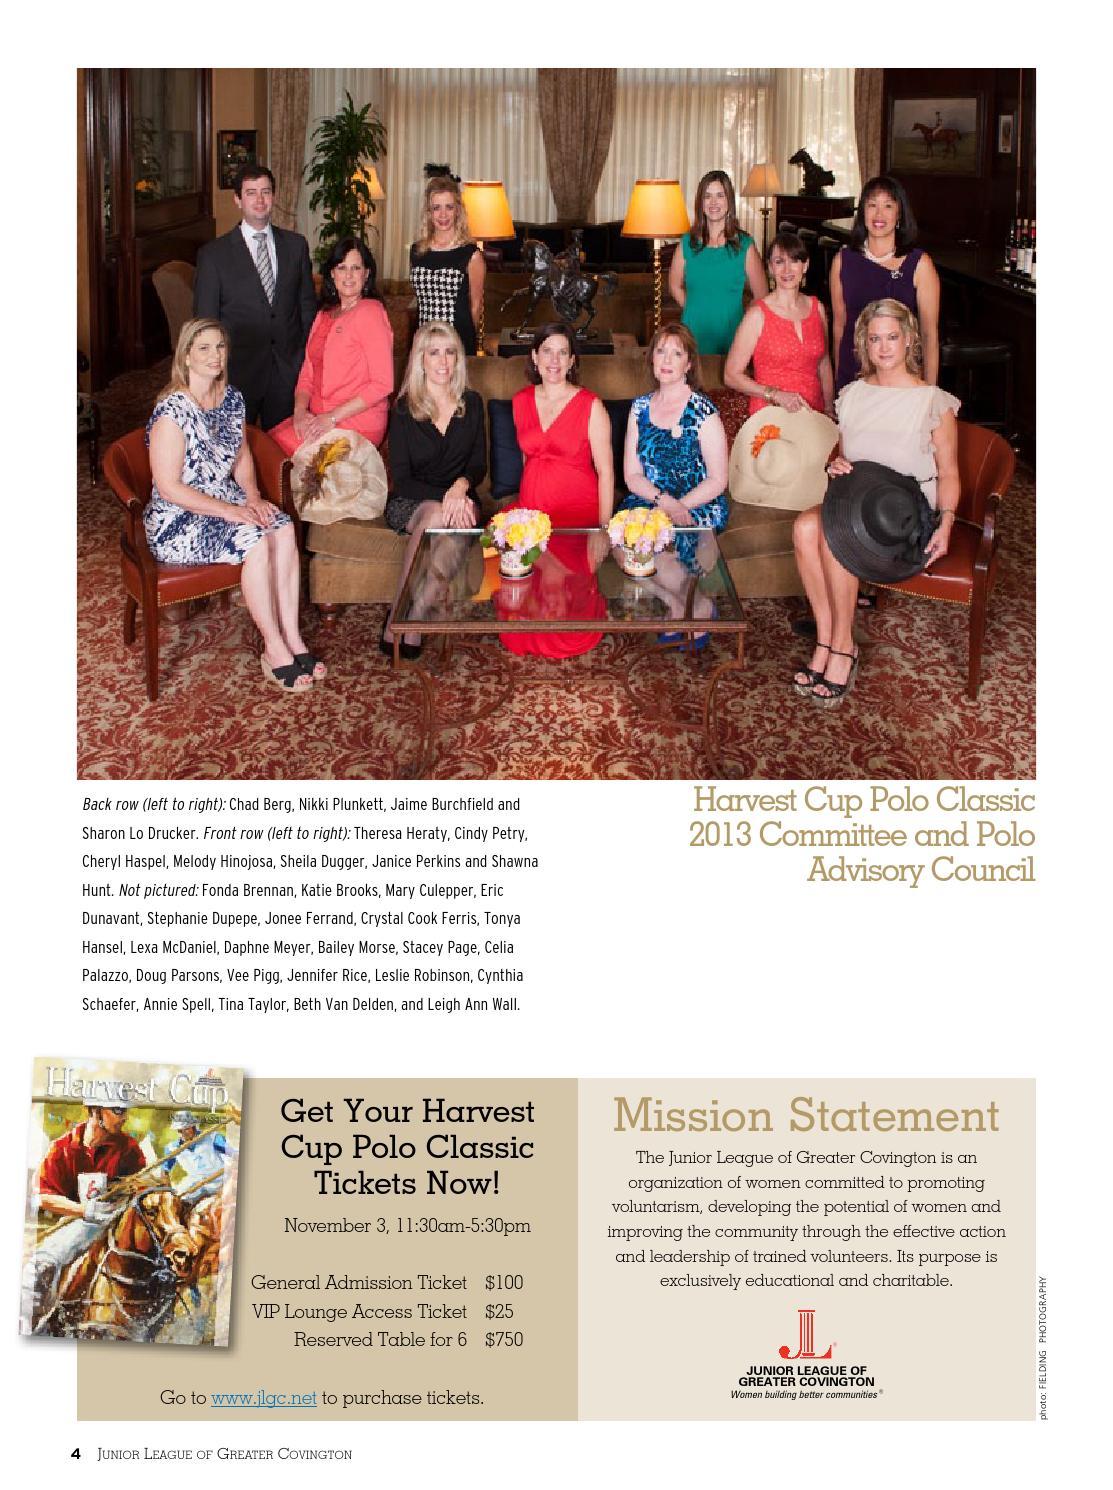 September-October 2013 Issue of Inside Northside Magazine by